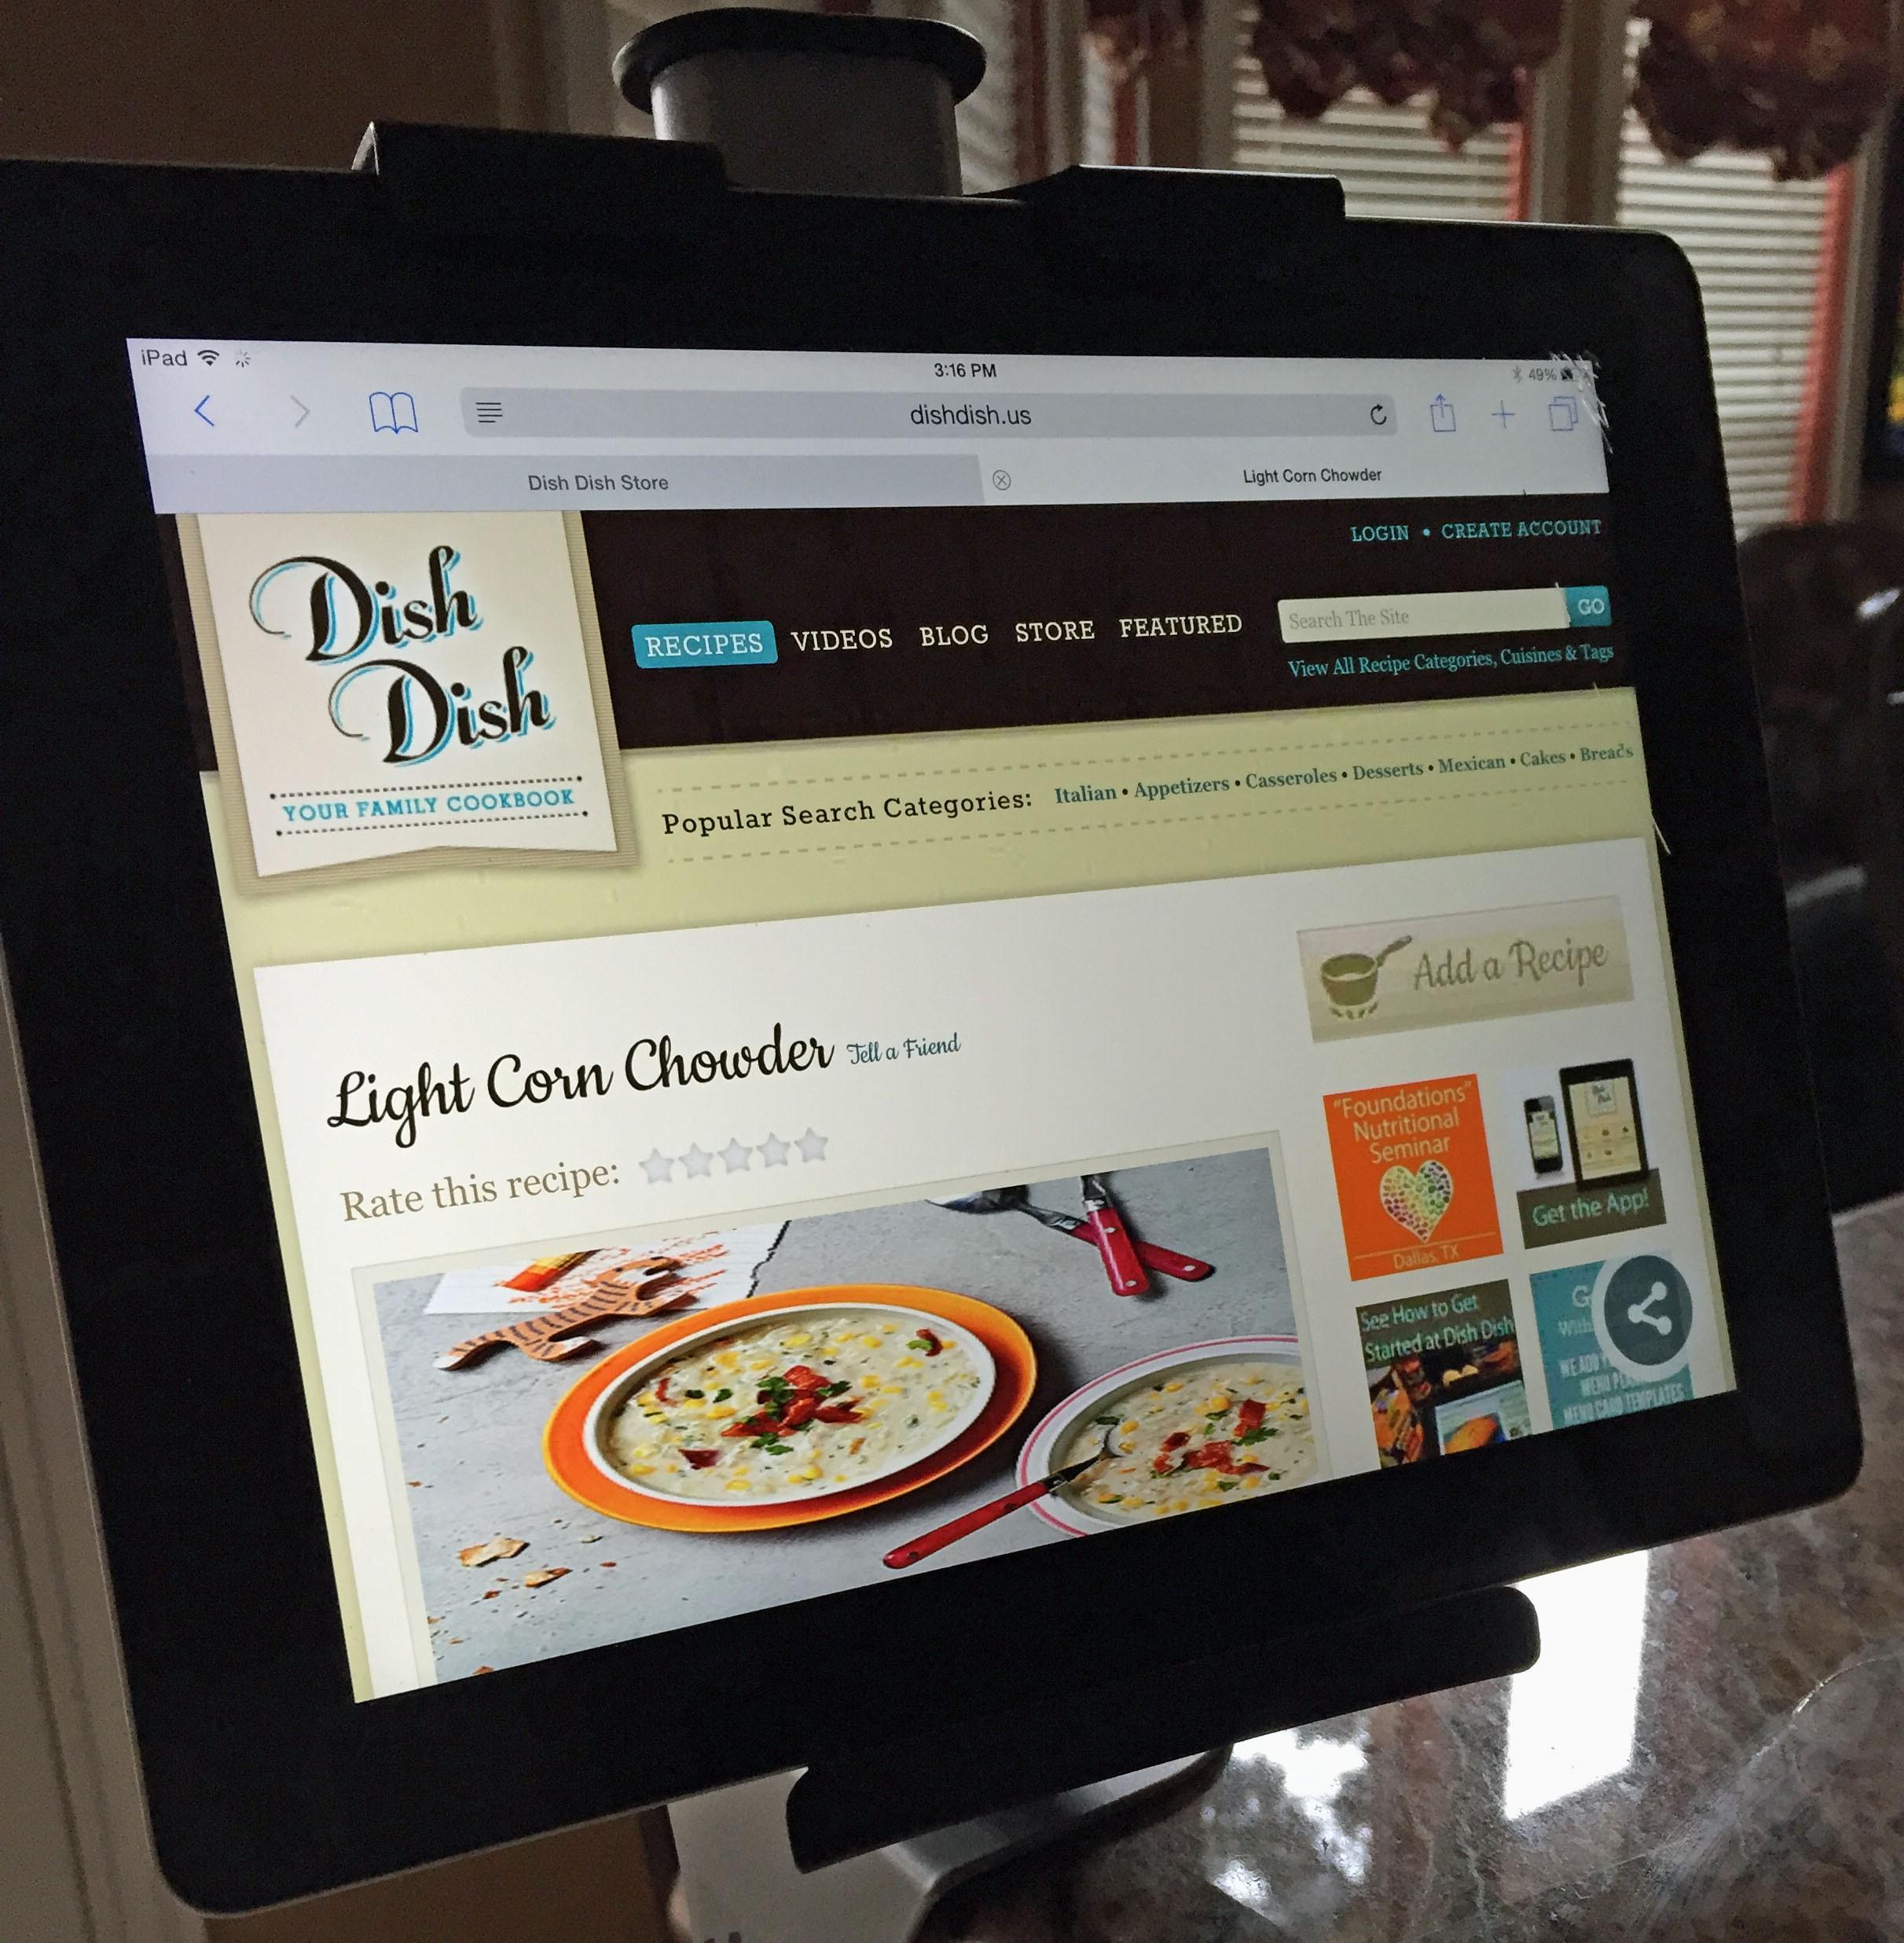 dish dish cookbooks to digital recipe book